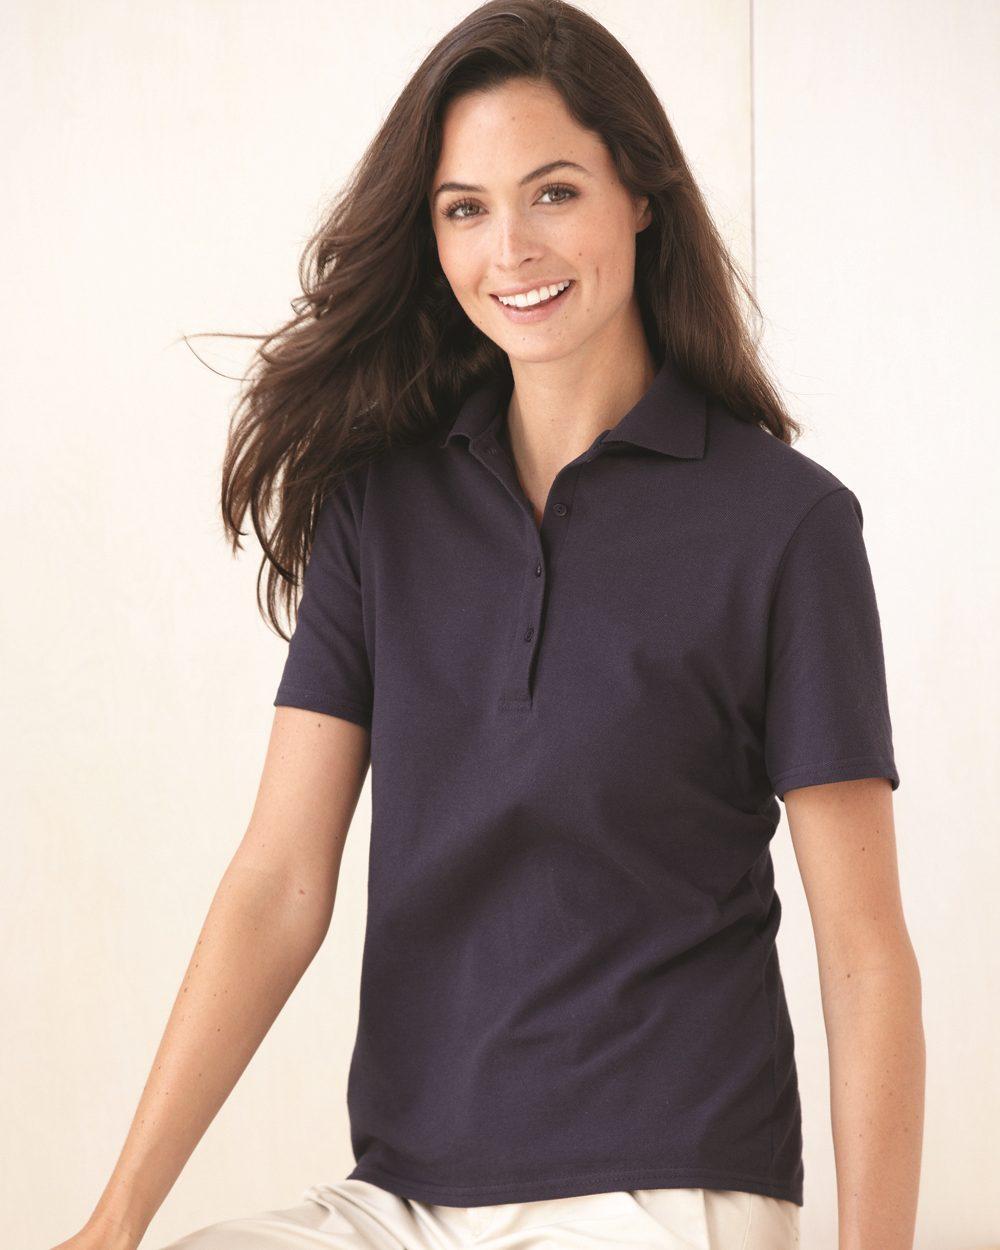 Stedman By Hanes 035X Ladies' Cotton Pique Sport Shirt